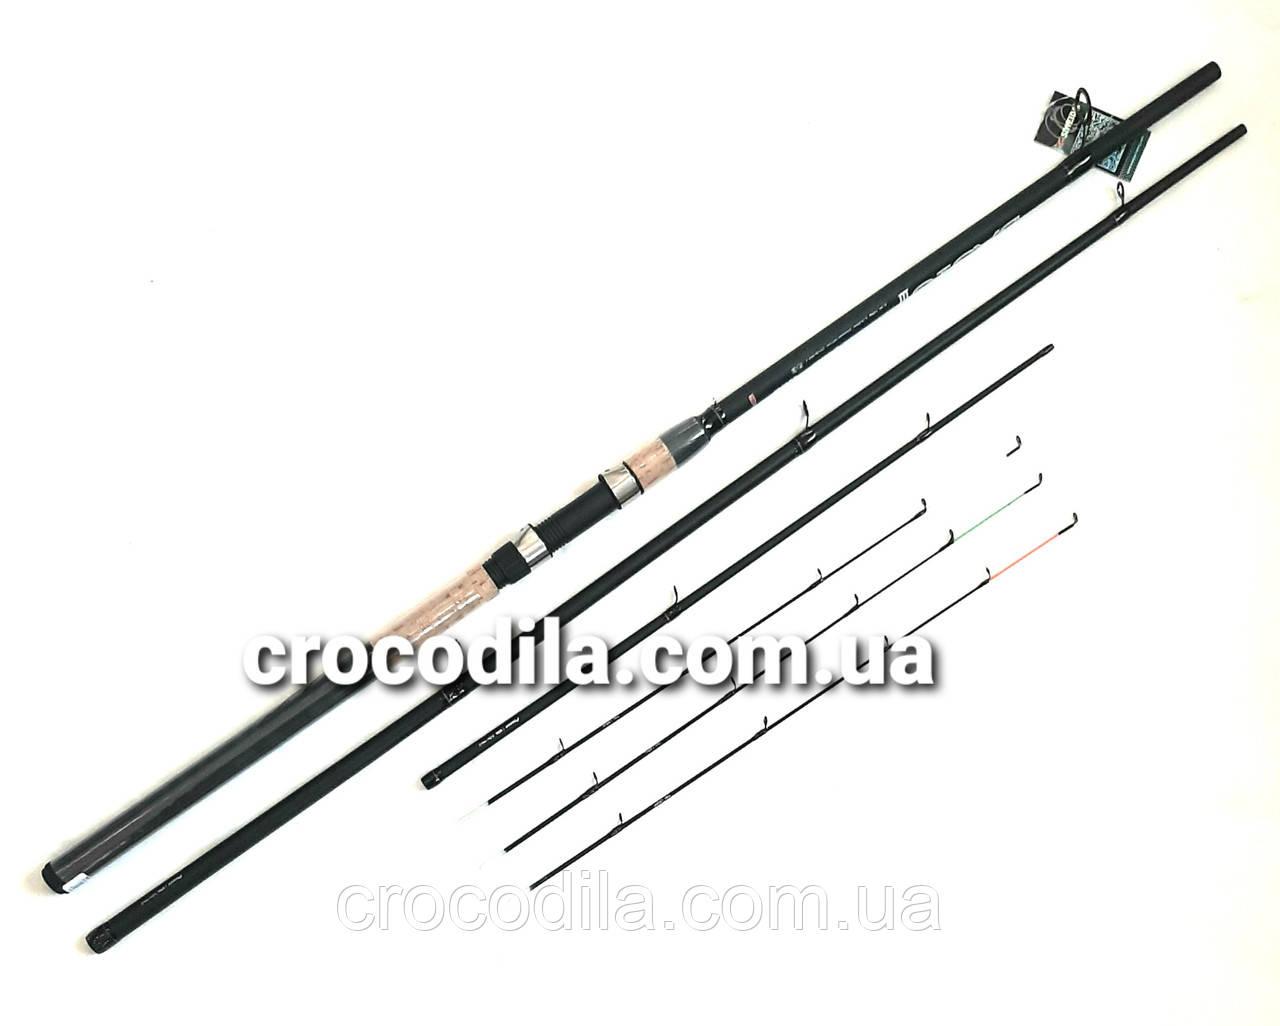 Фидерное удилище Siweida Basic Feeder 3.3 m 180 грамм